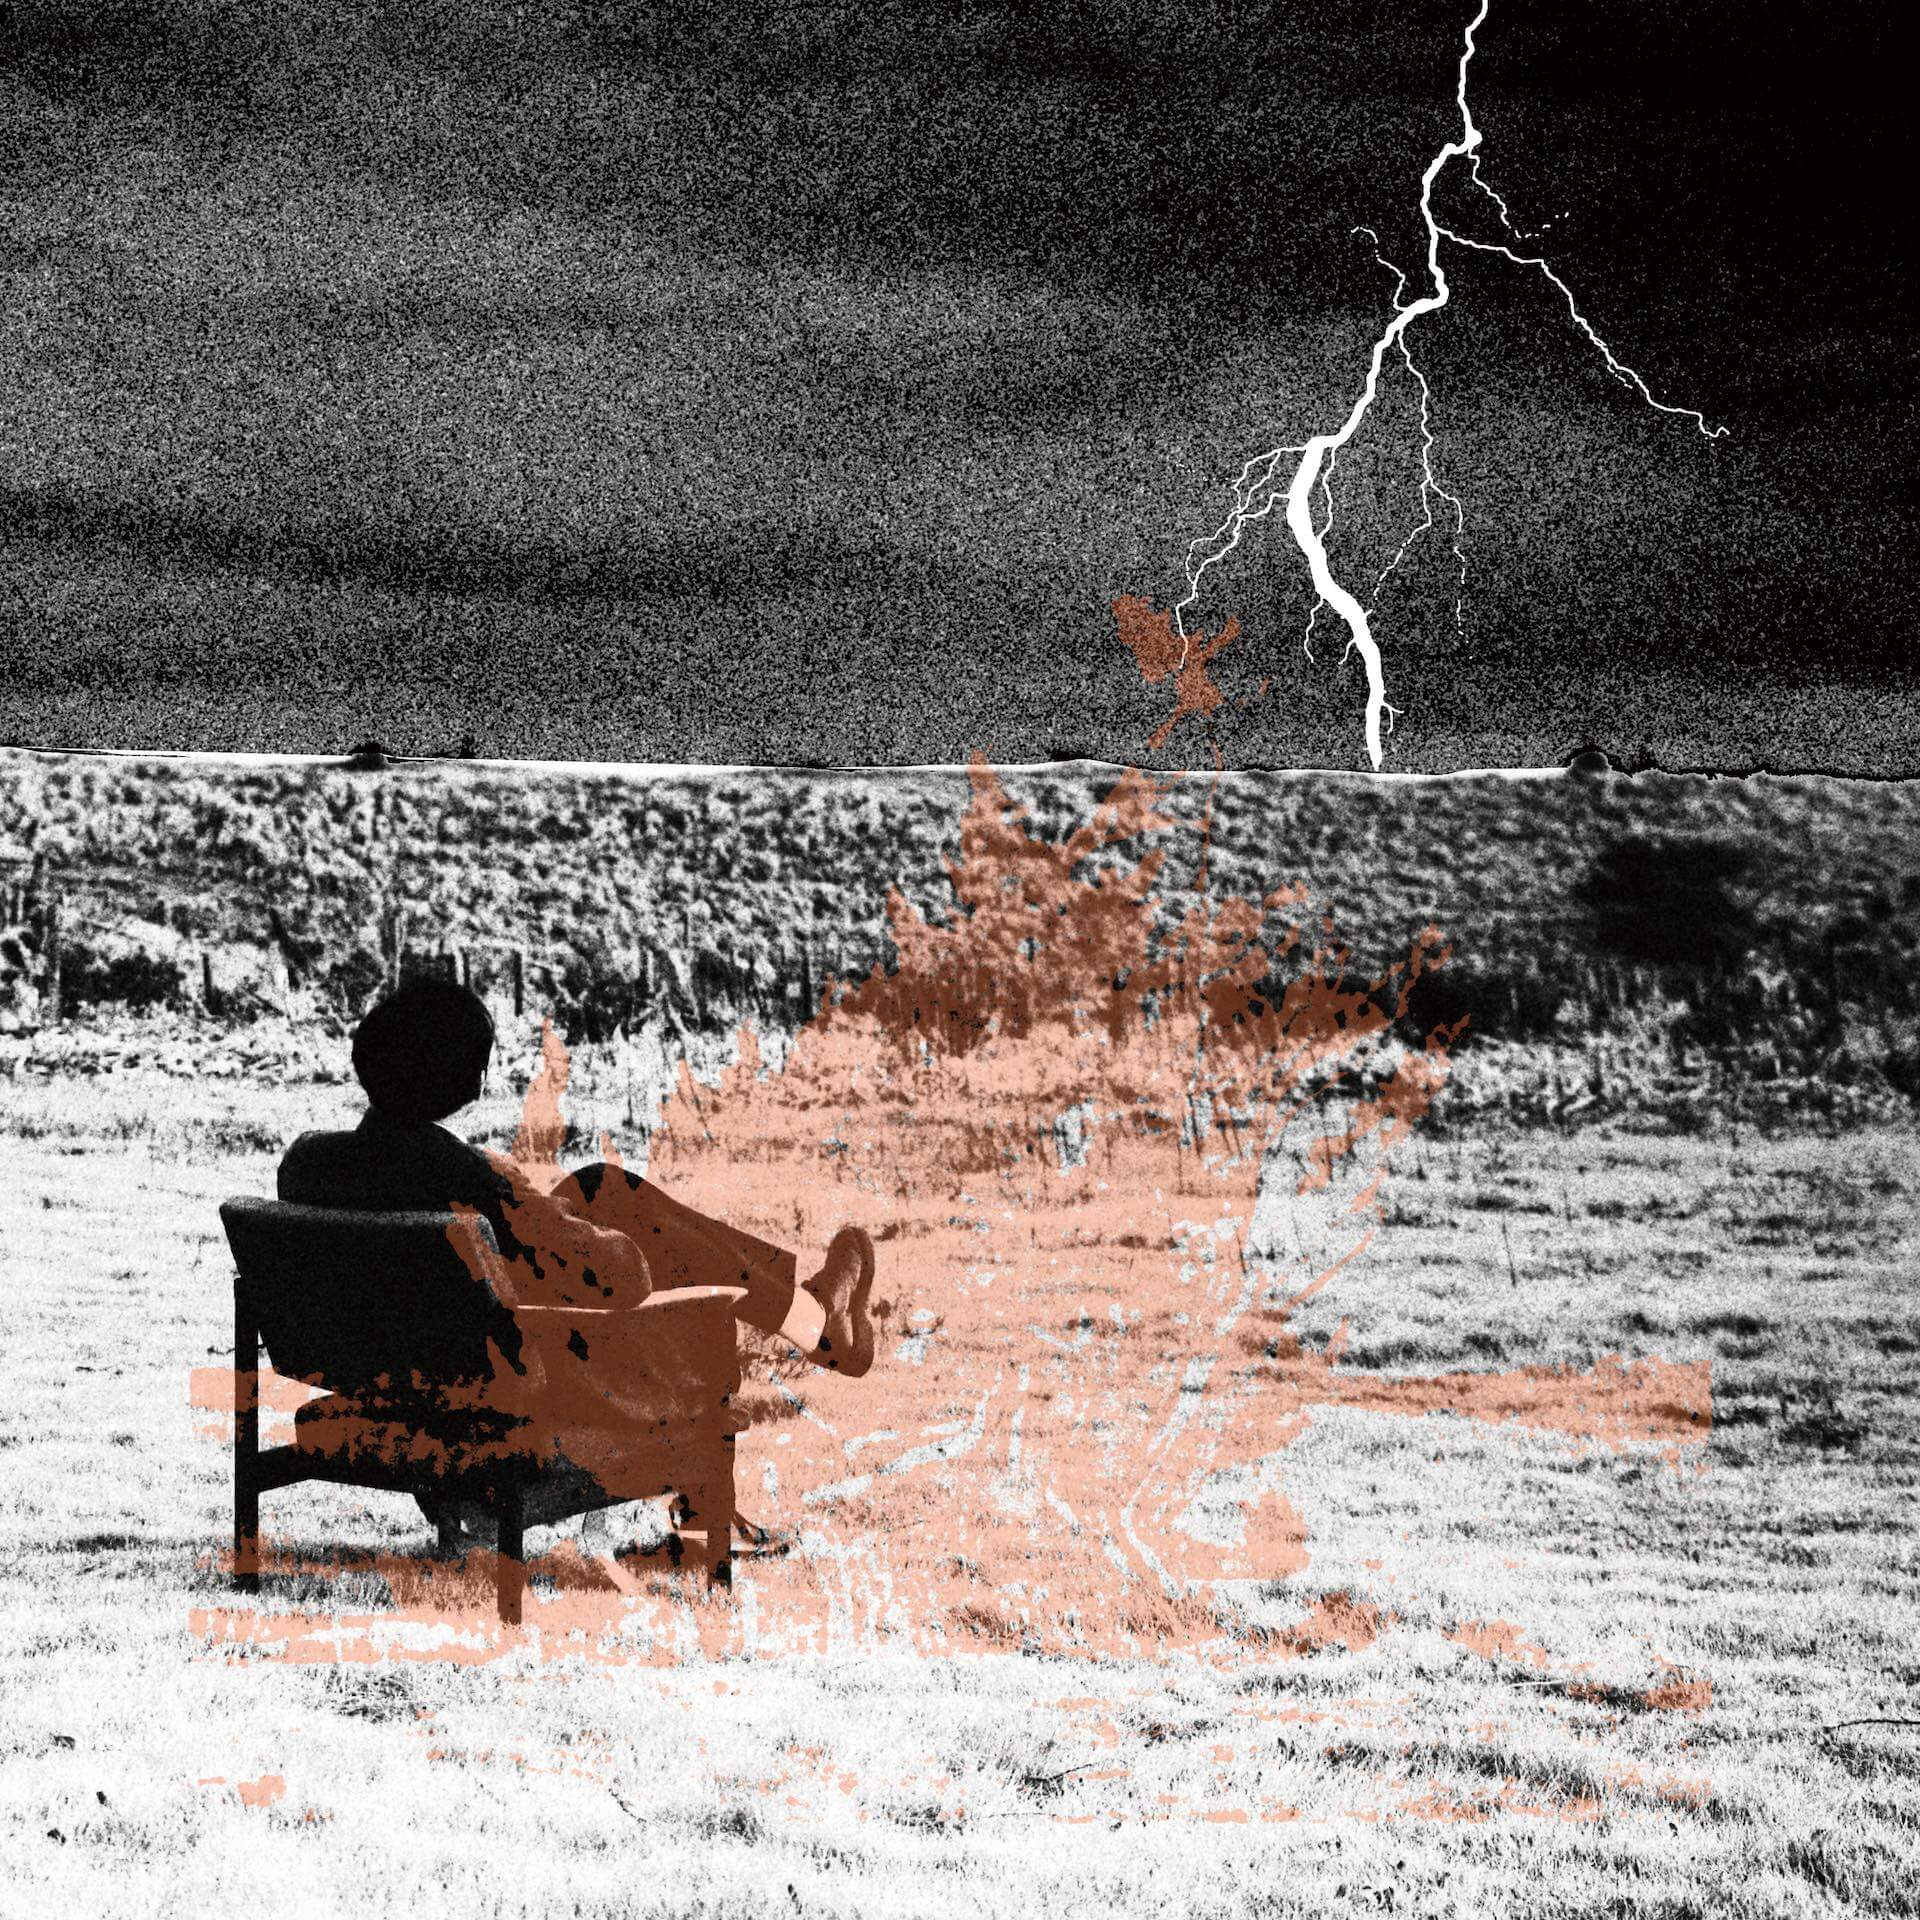 cero高城昌平「Shohei Takagi Parallela Botanica」の1stアルバム『Triptych』ジャケ写や収録曲が公開!初回盤にはライブやインタビューの映像特典も music20310_takagishouhei_triptych_03